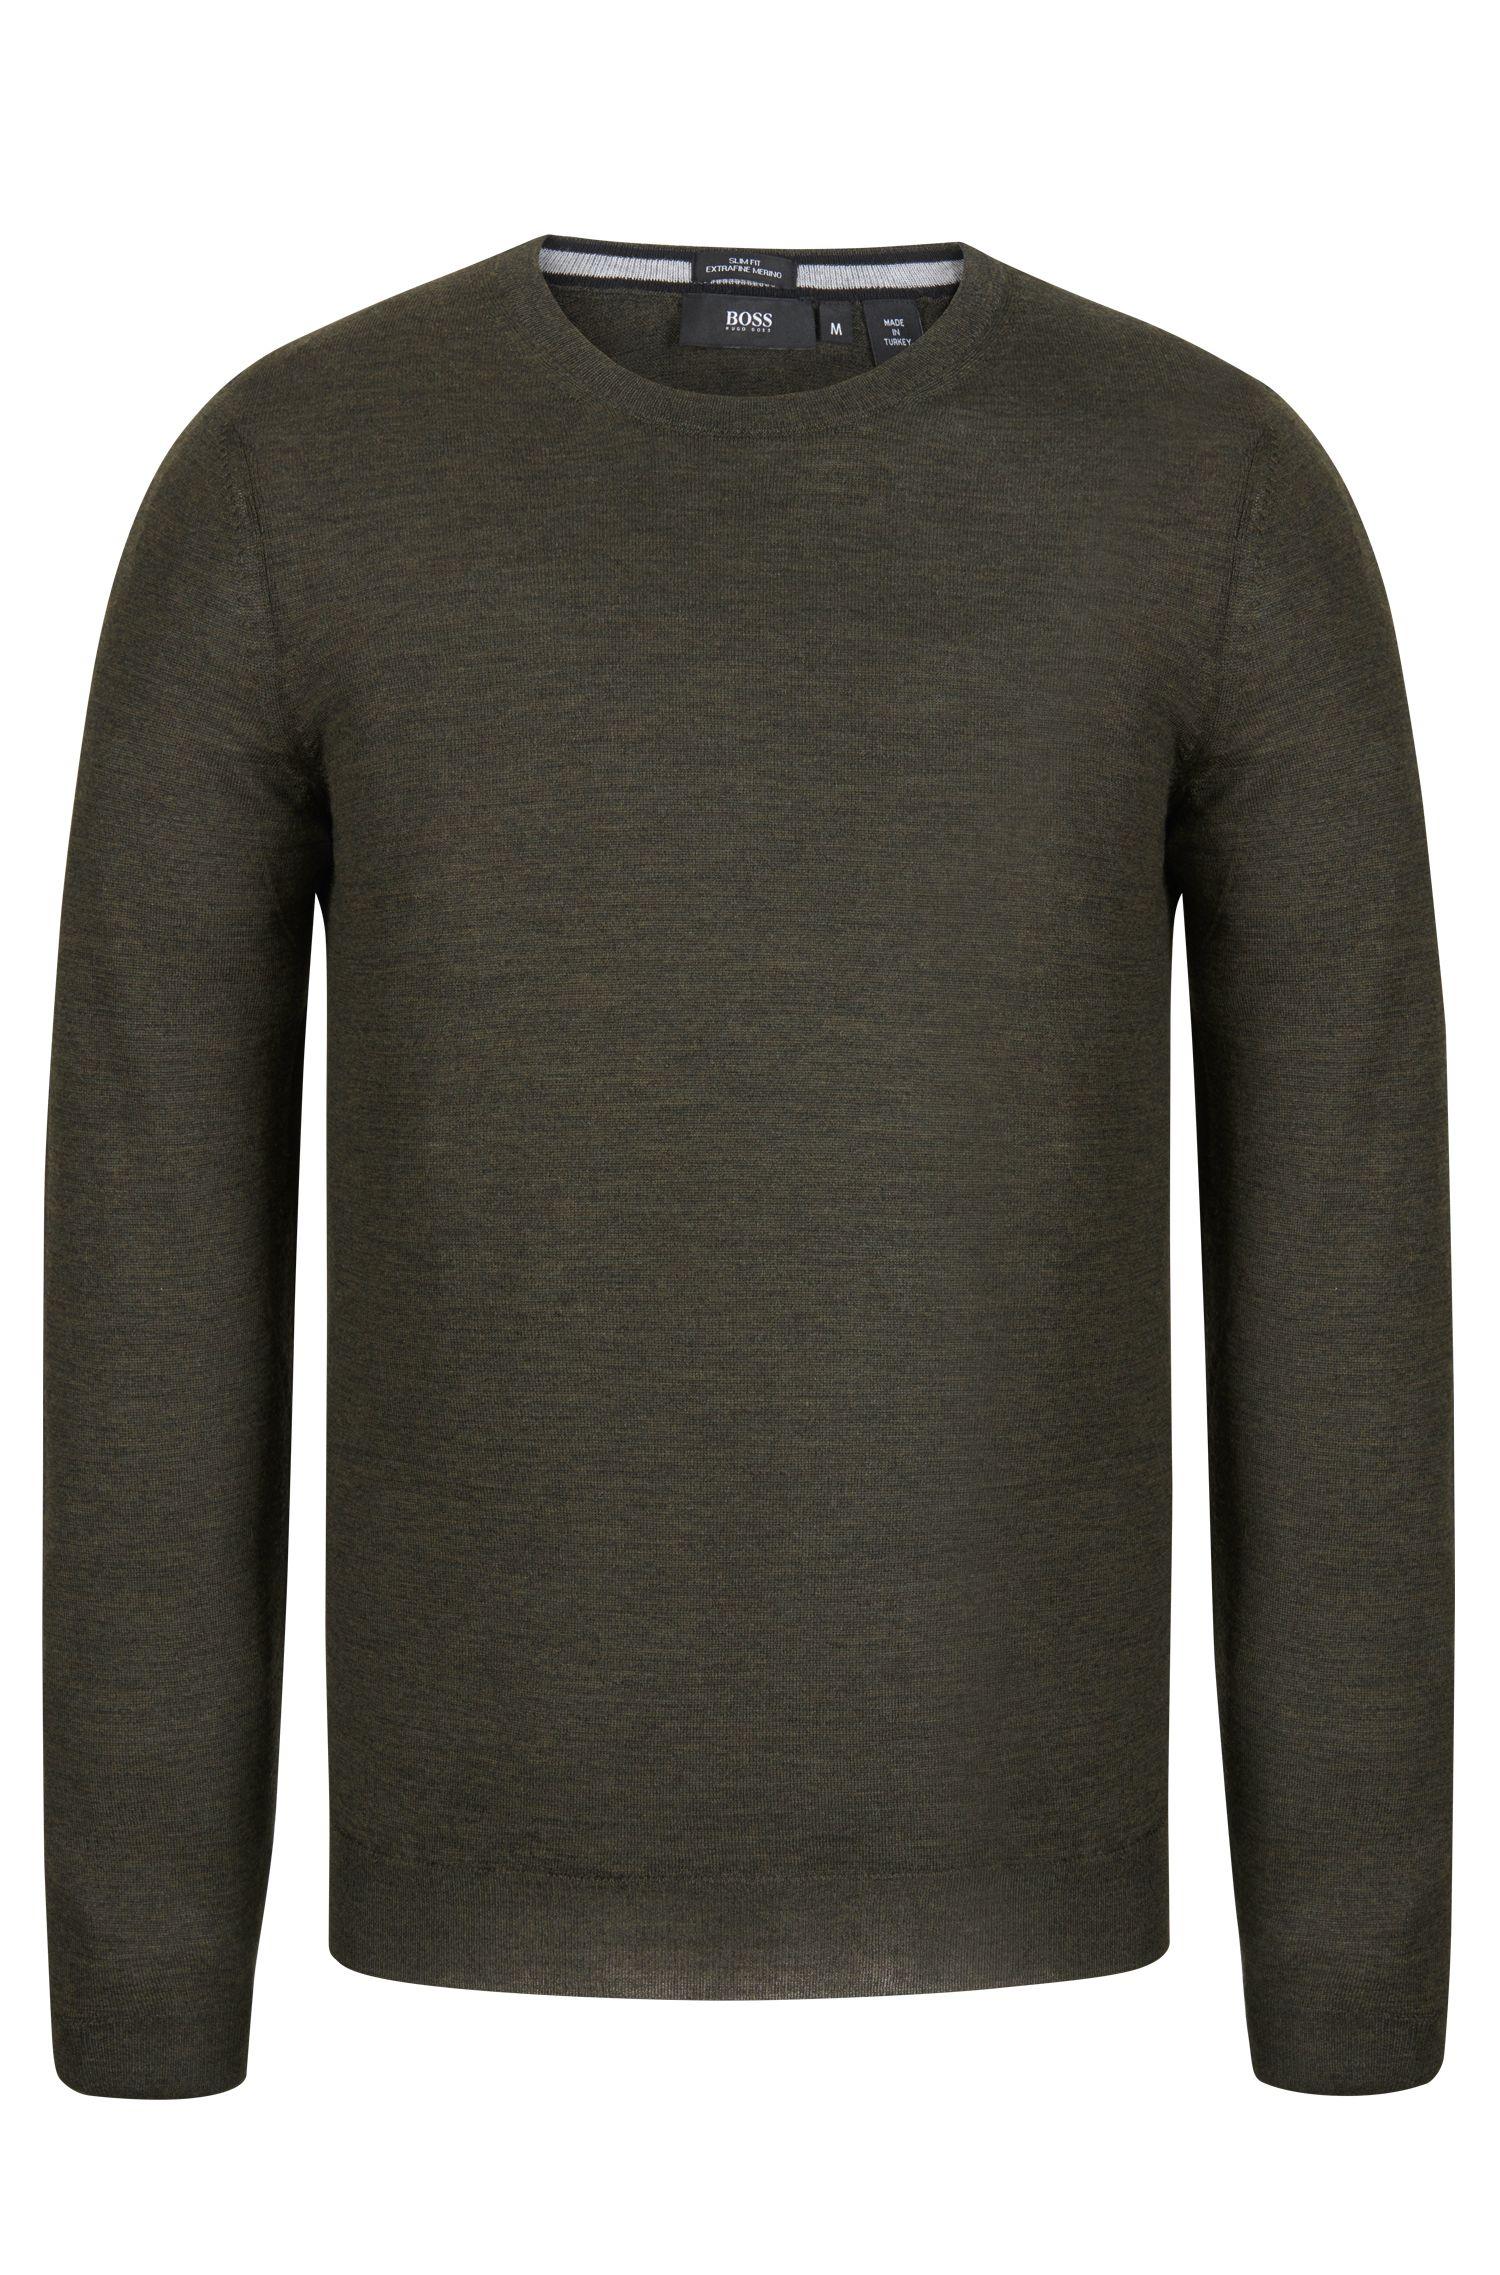 Extra-Fine Merino Wool Sweater | Leno N